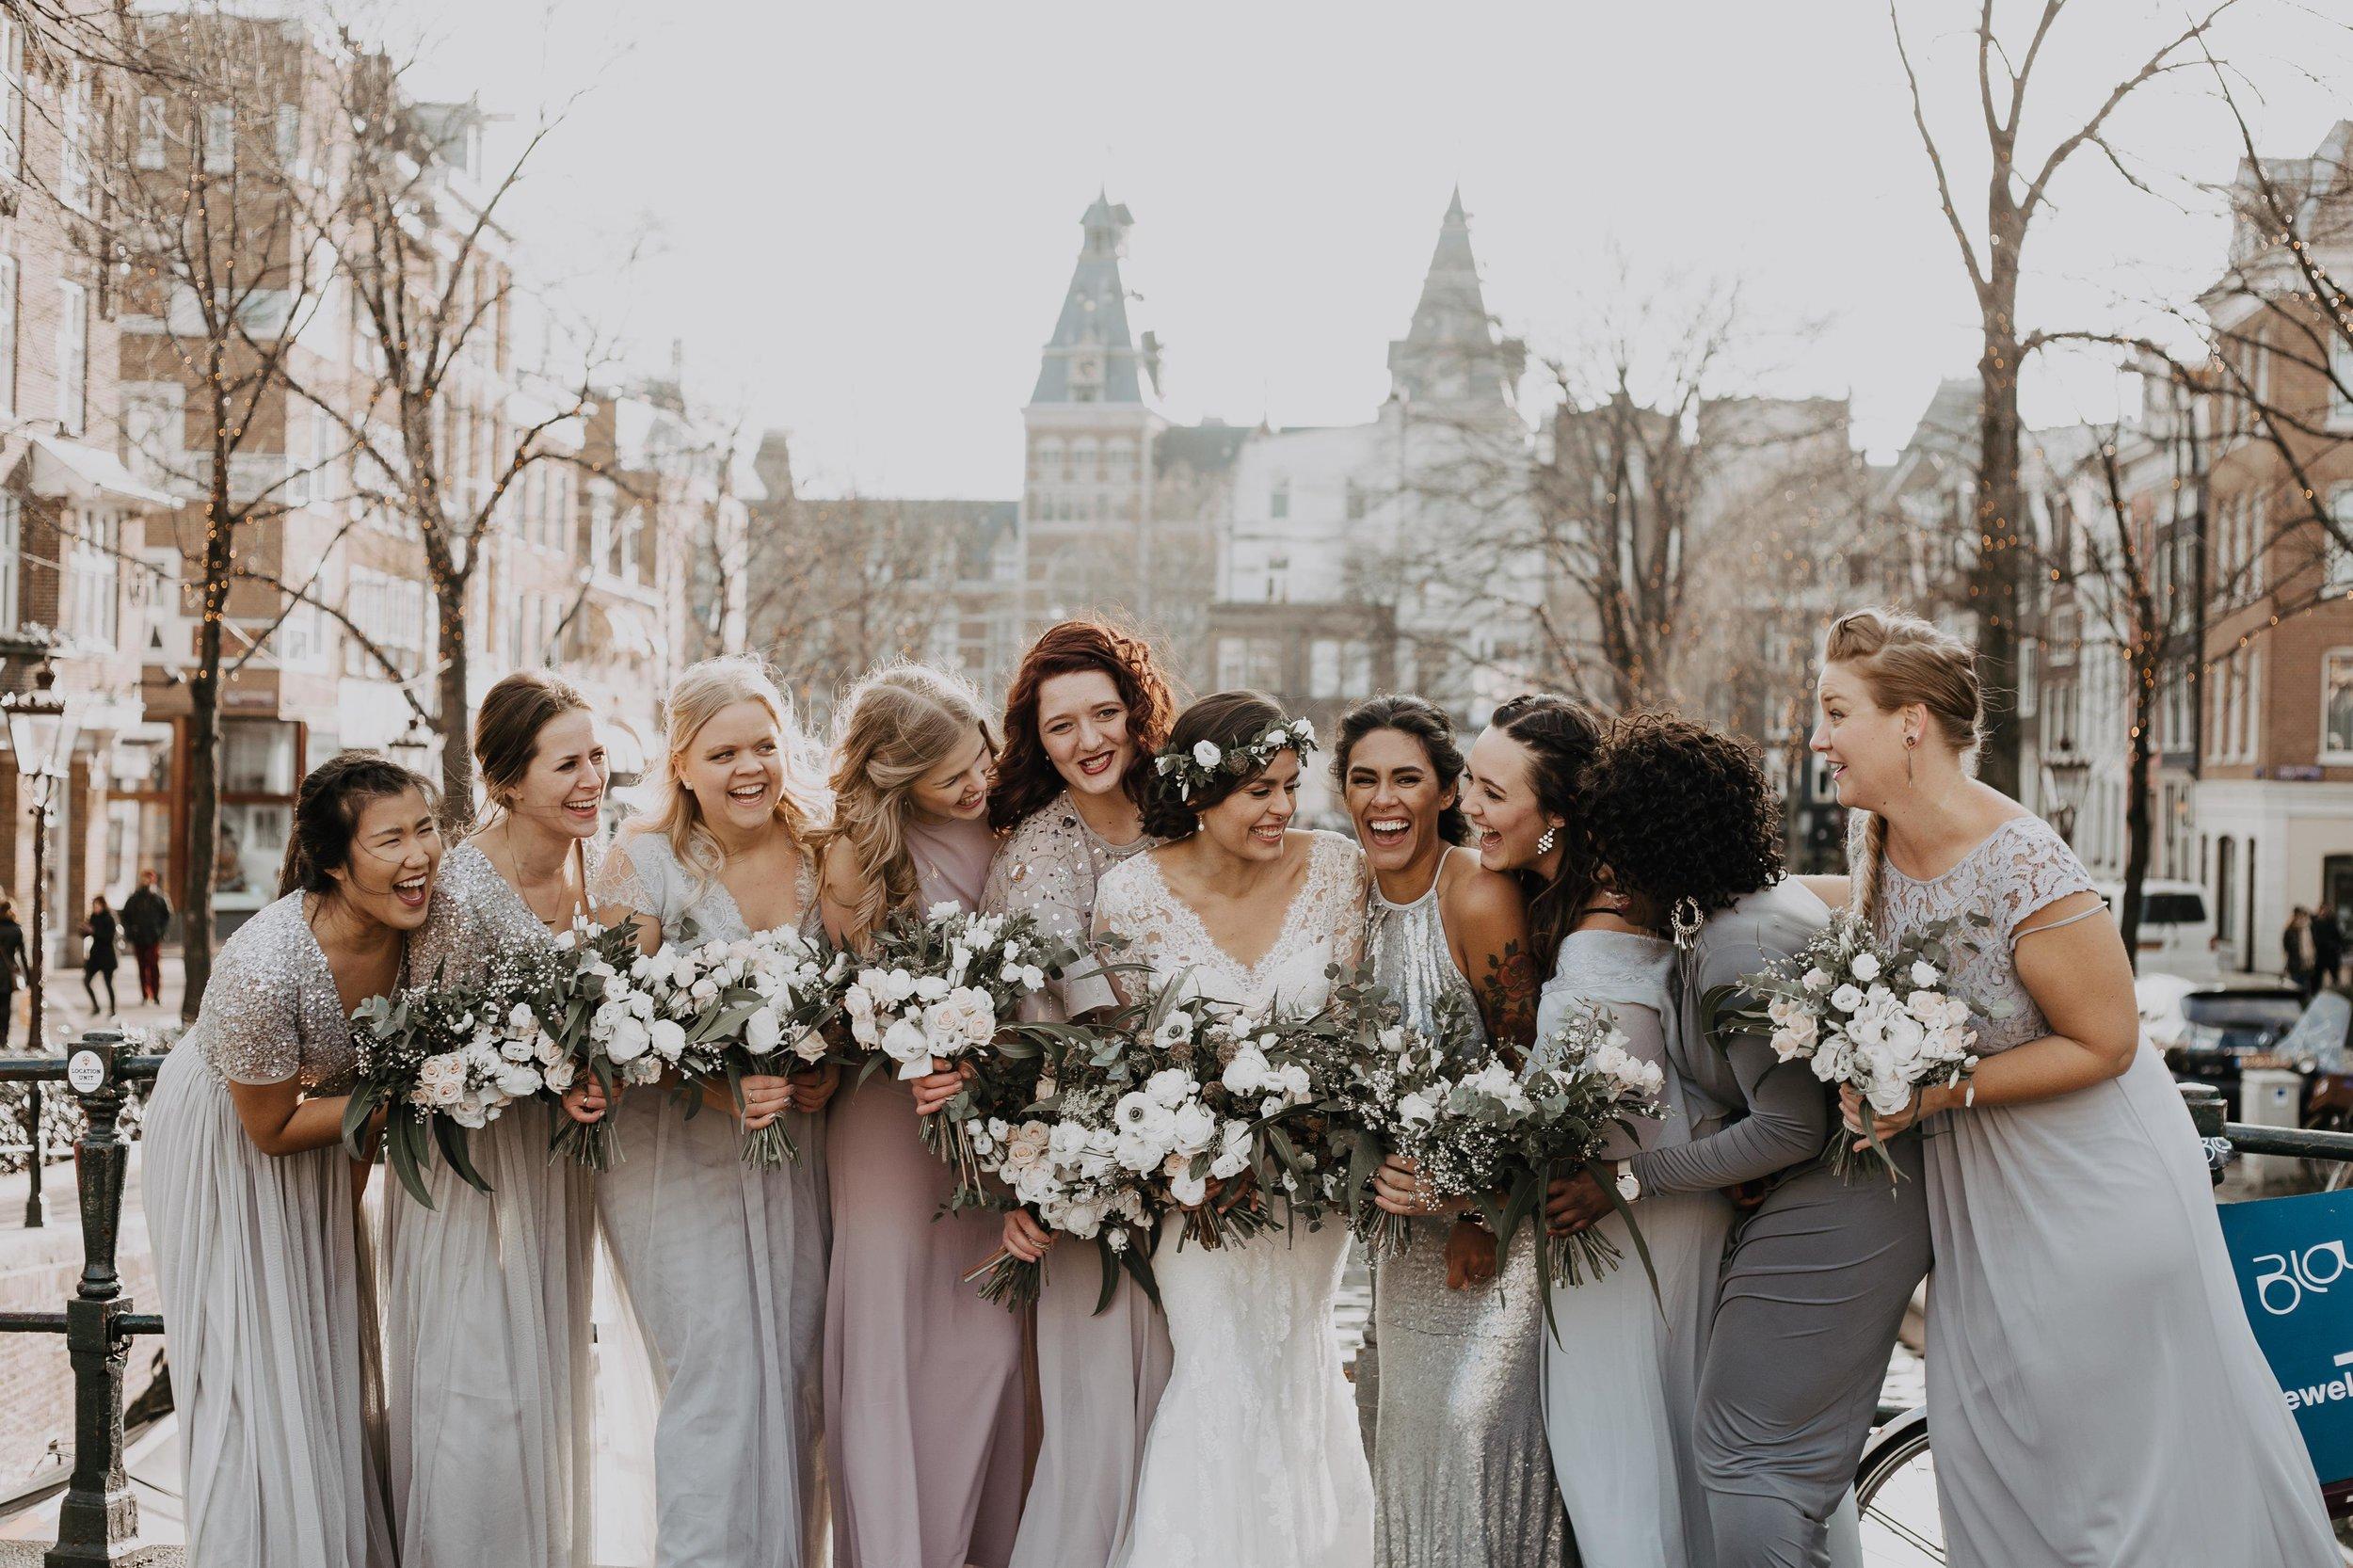 FULL FLORAL WEDDING SERVICE